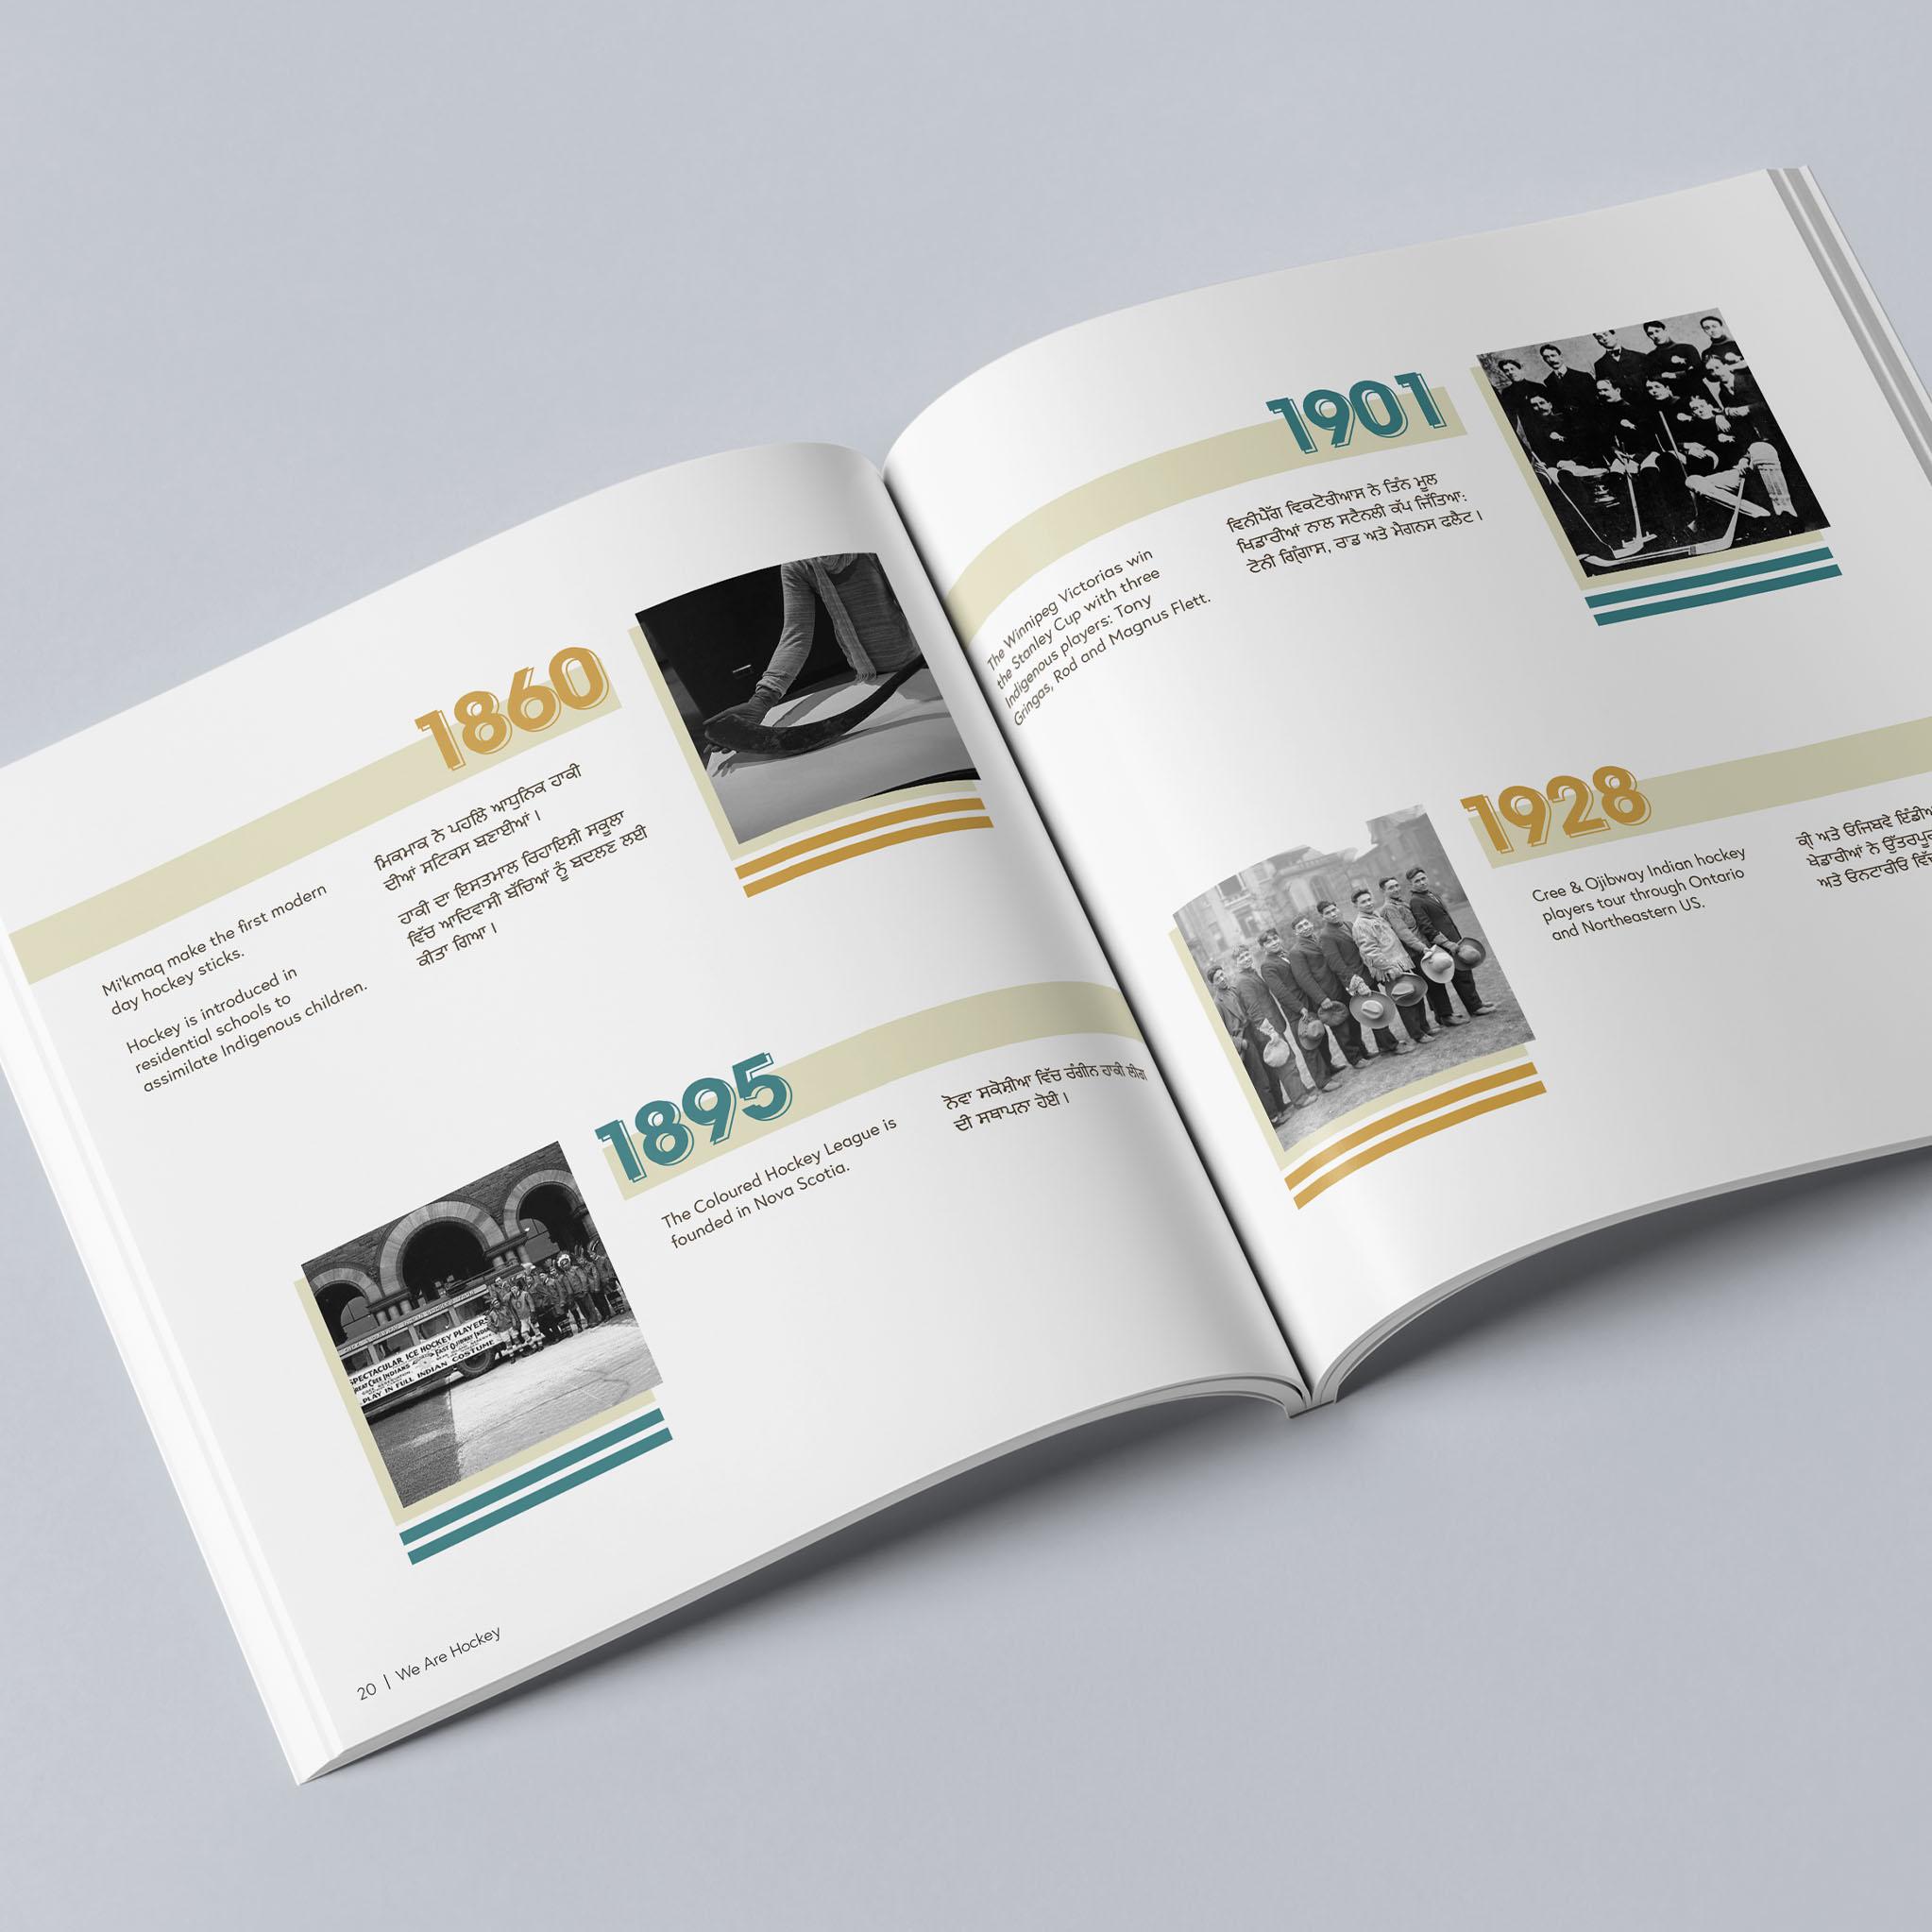 altdesignhouse-wearehockey-catalog02.jpg